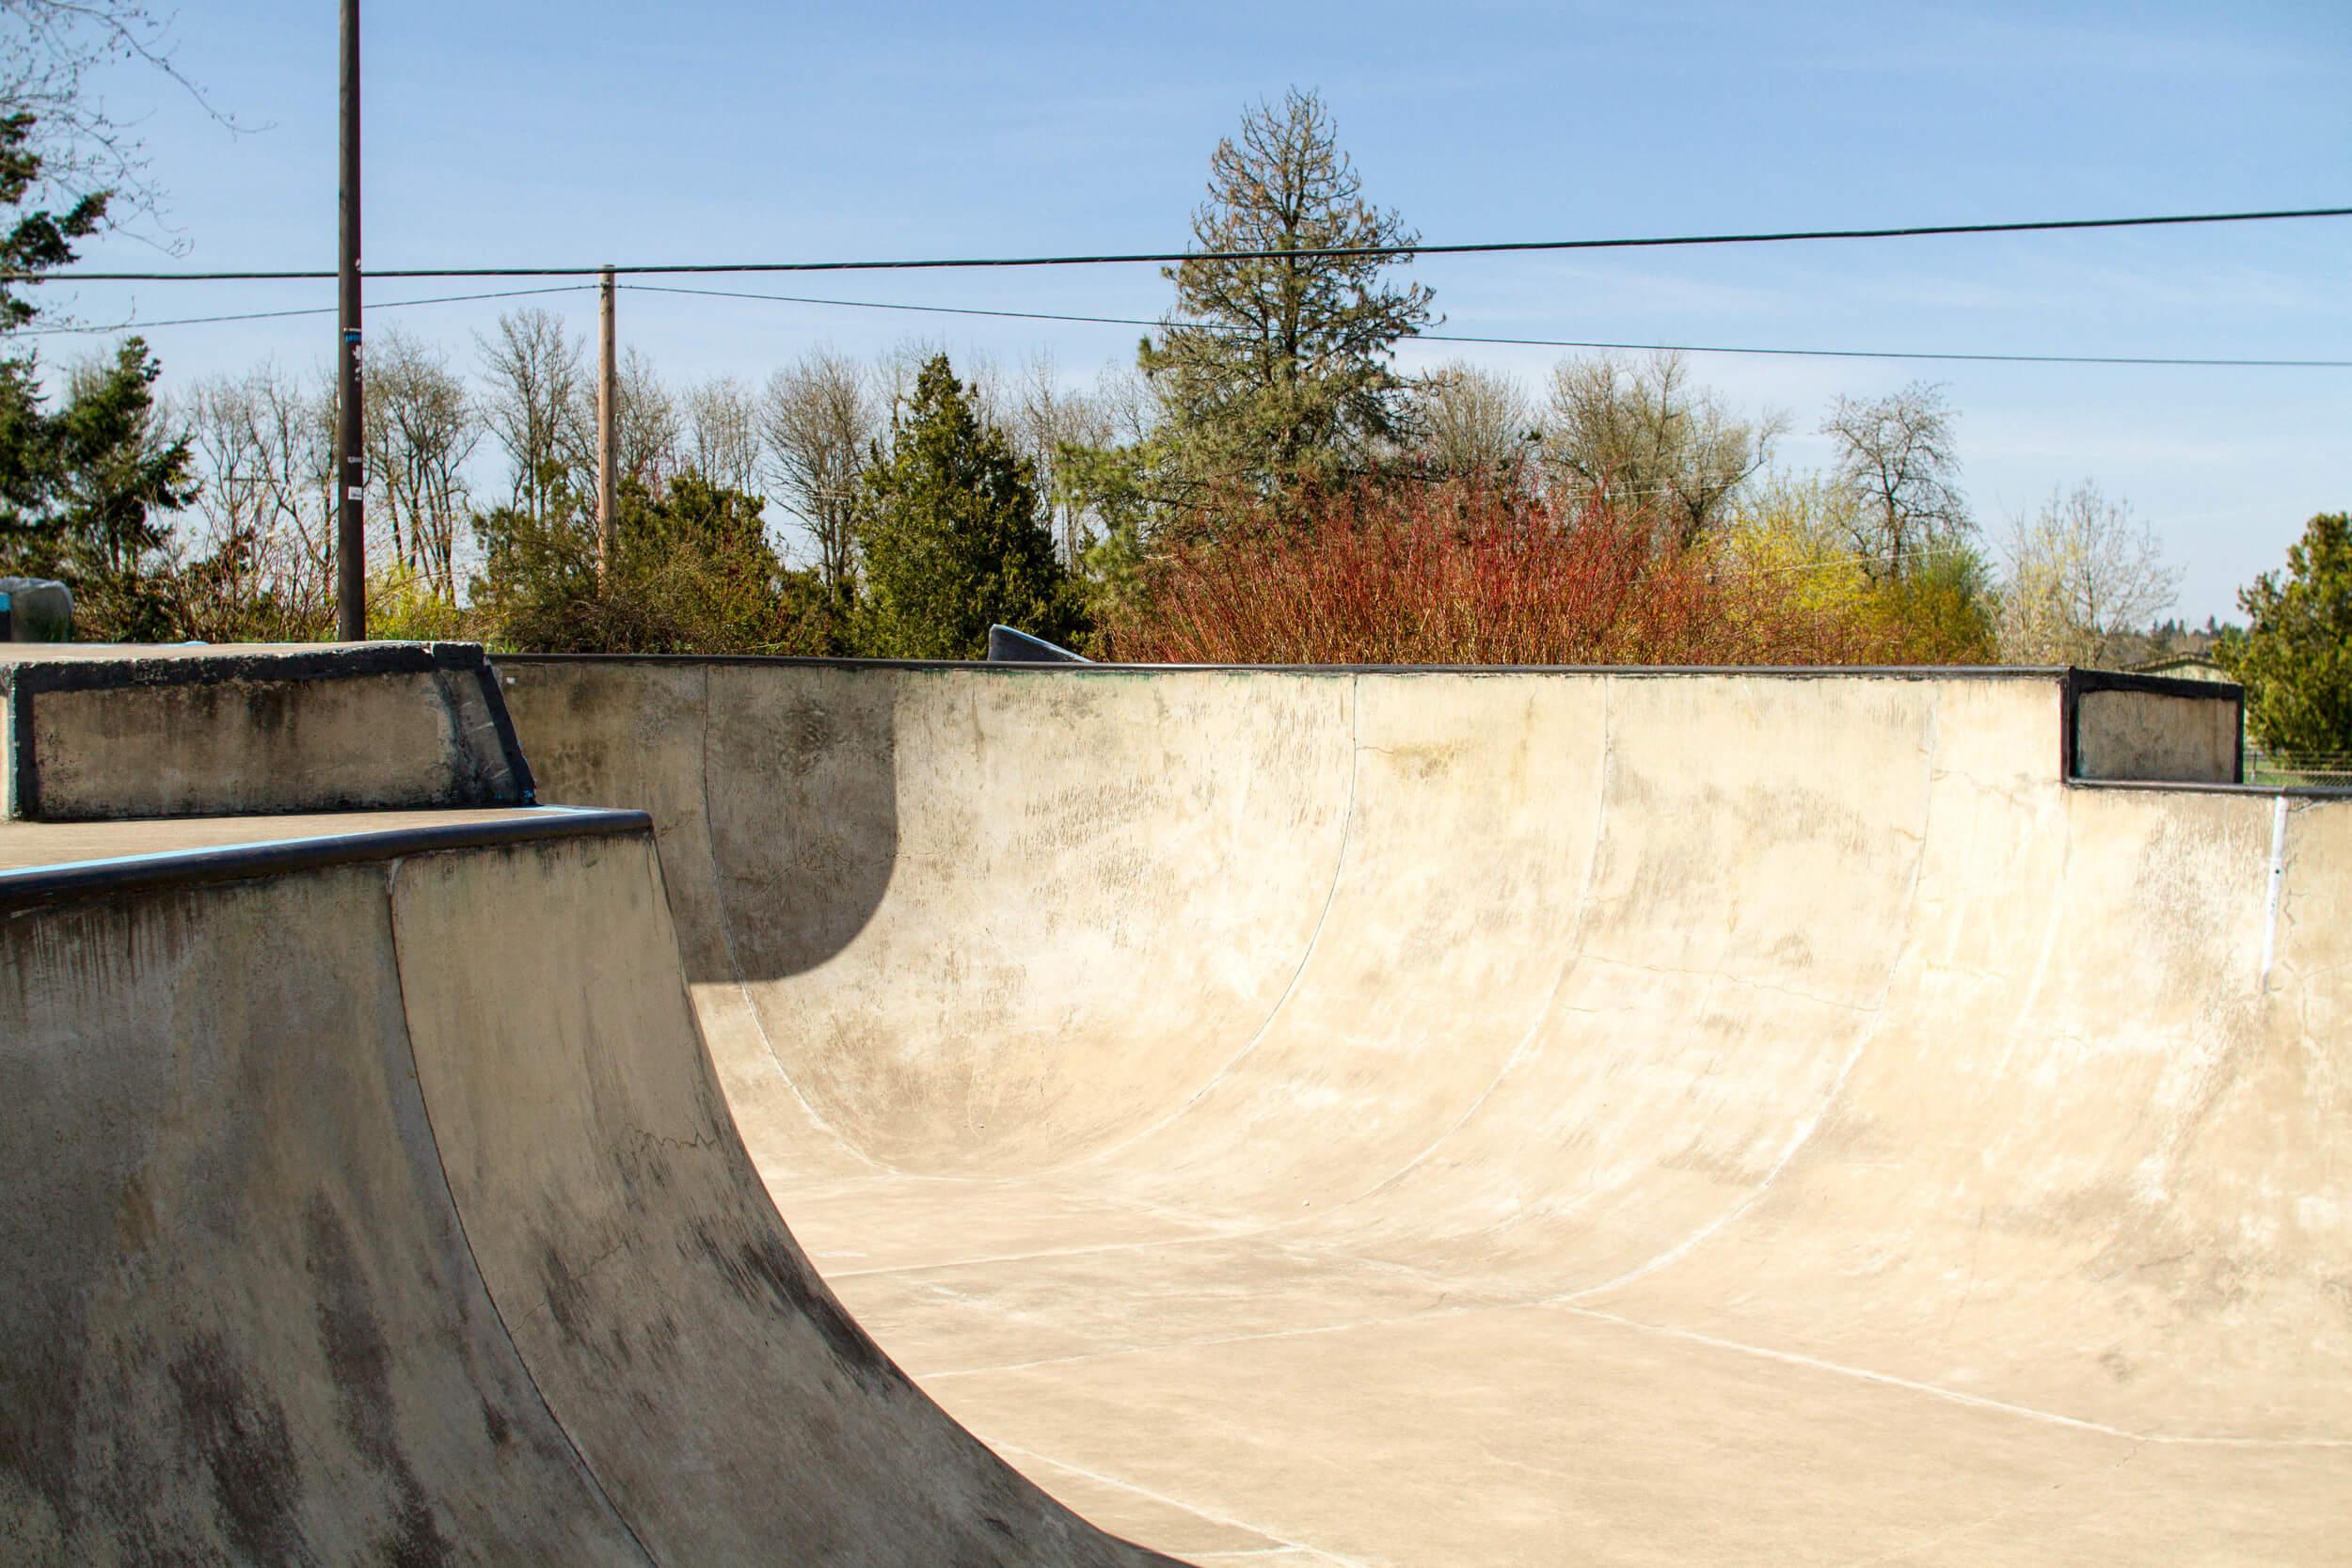 brian haney memorial skatepark, aumsville, oregon